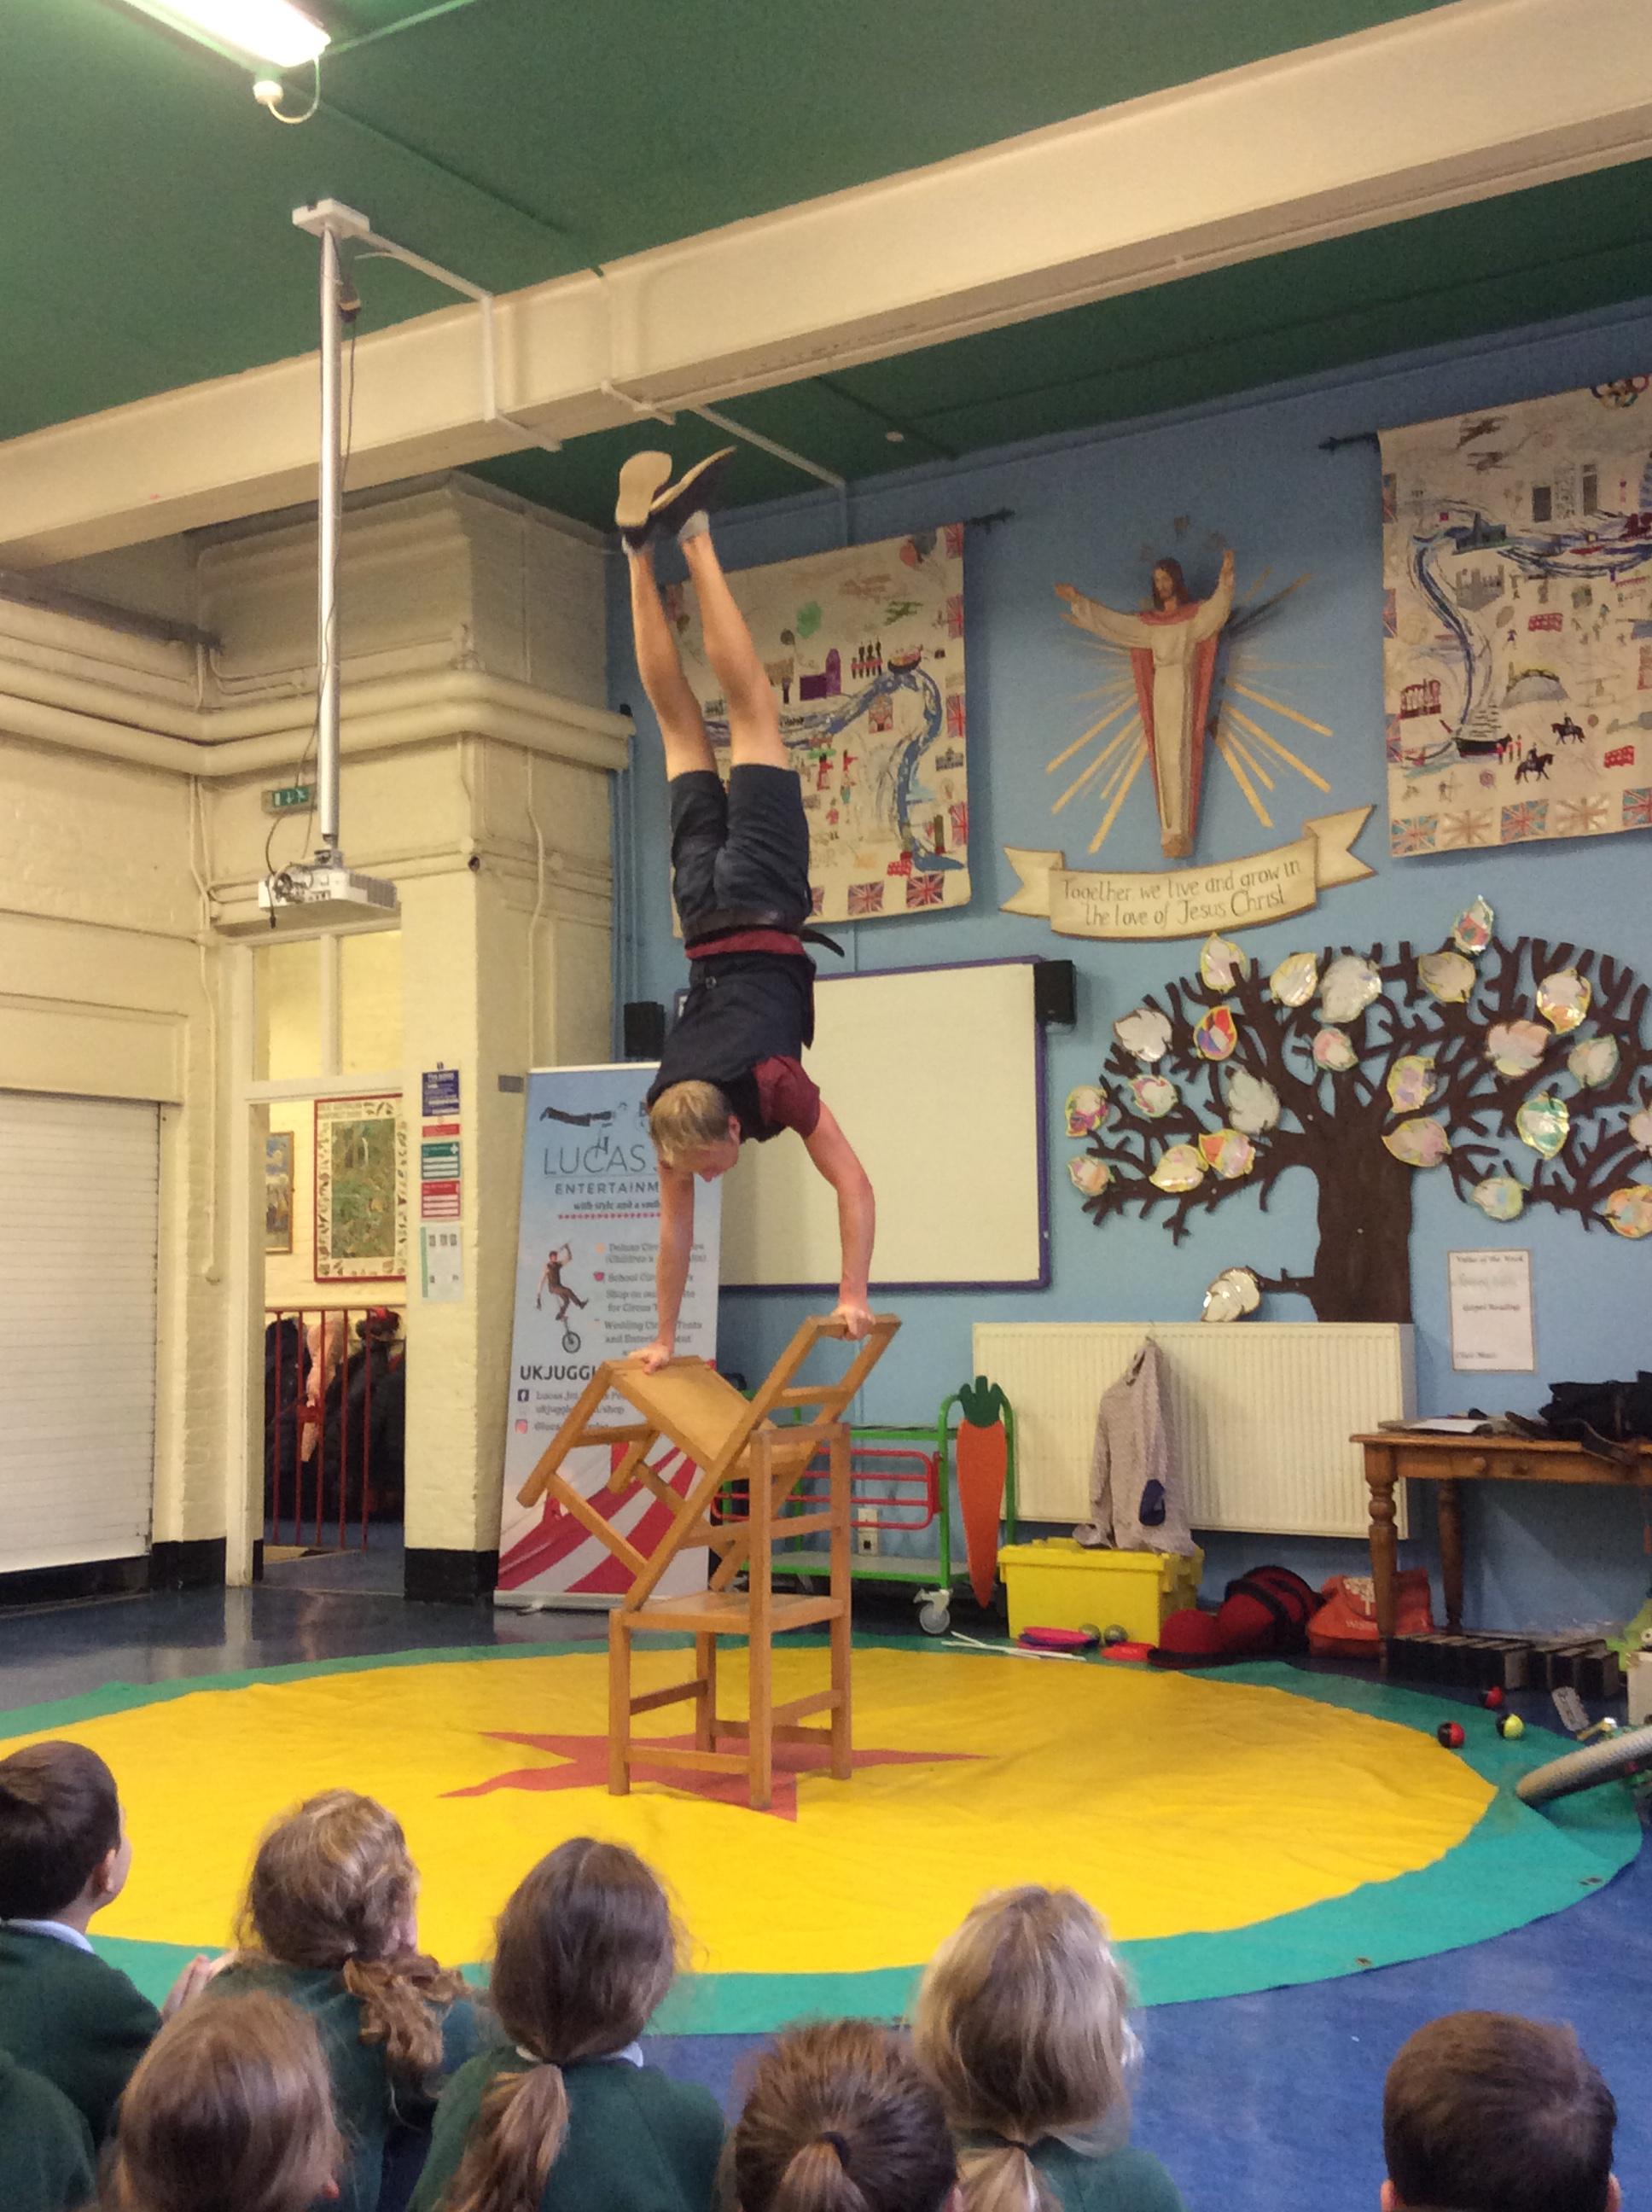 acrobatic school circus show